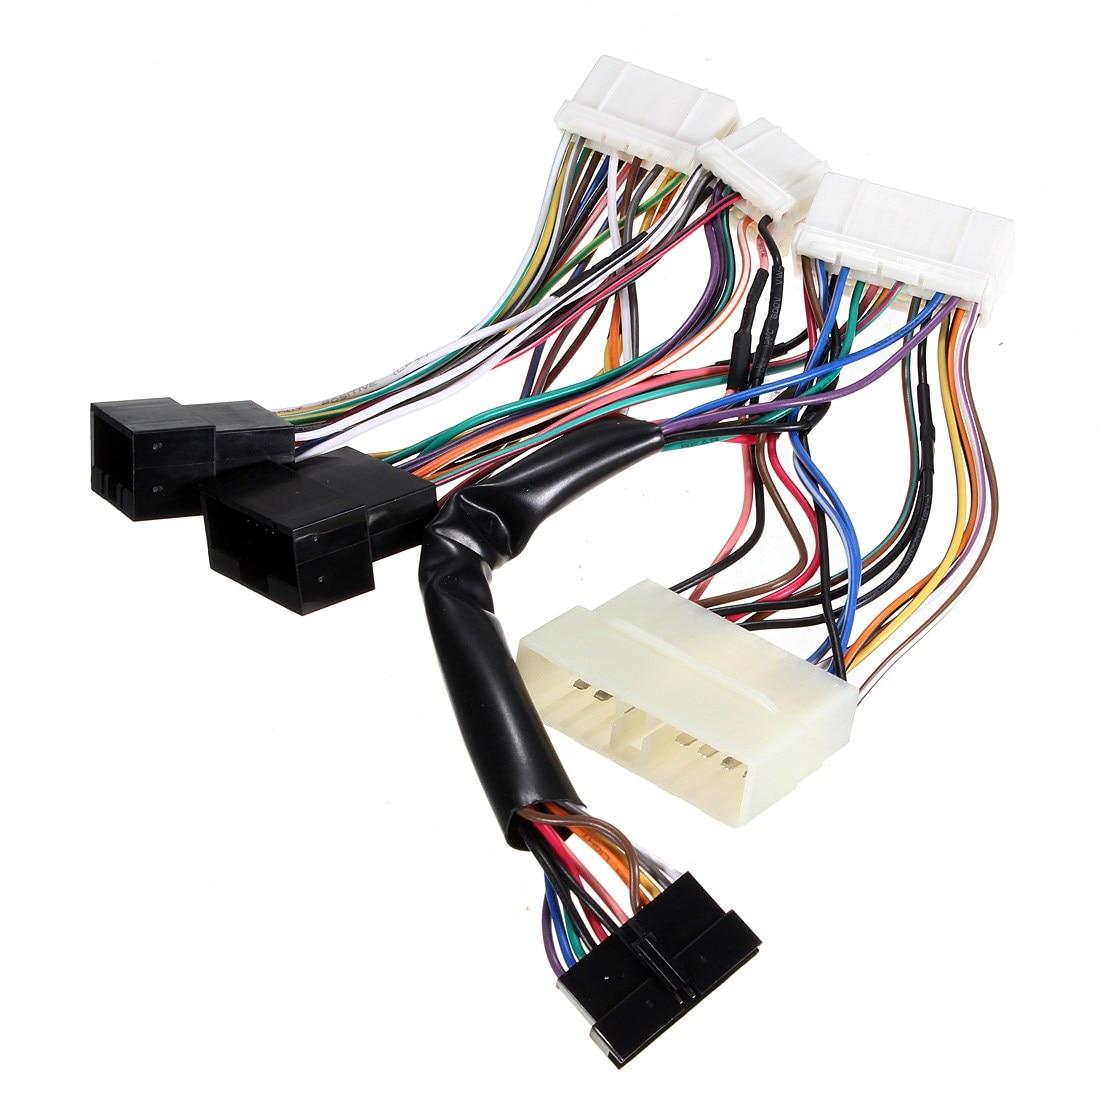 Car OBD0 to OBD1 ECU Conversion Jumper Wire Wiring Harness For Honda For CRV/Civic 1988 1989 1990 1991